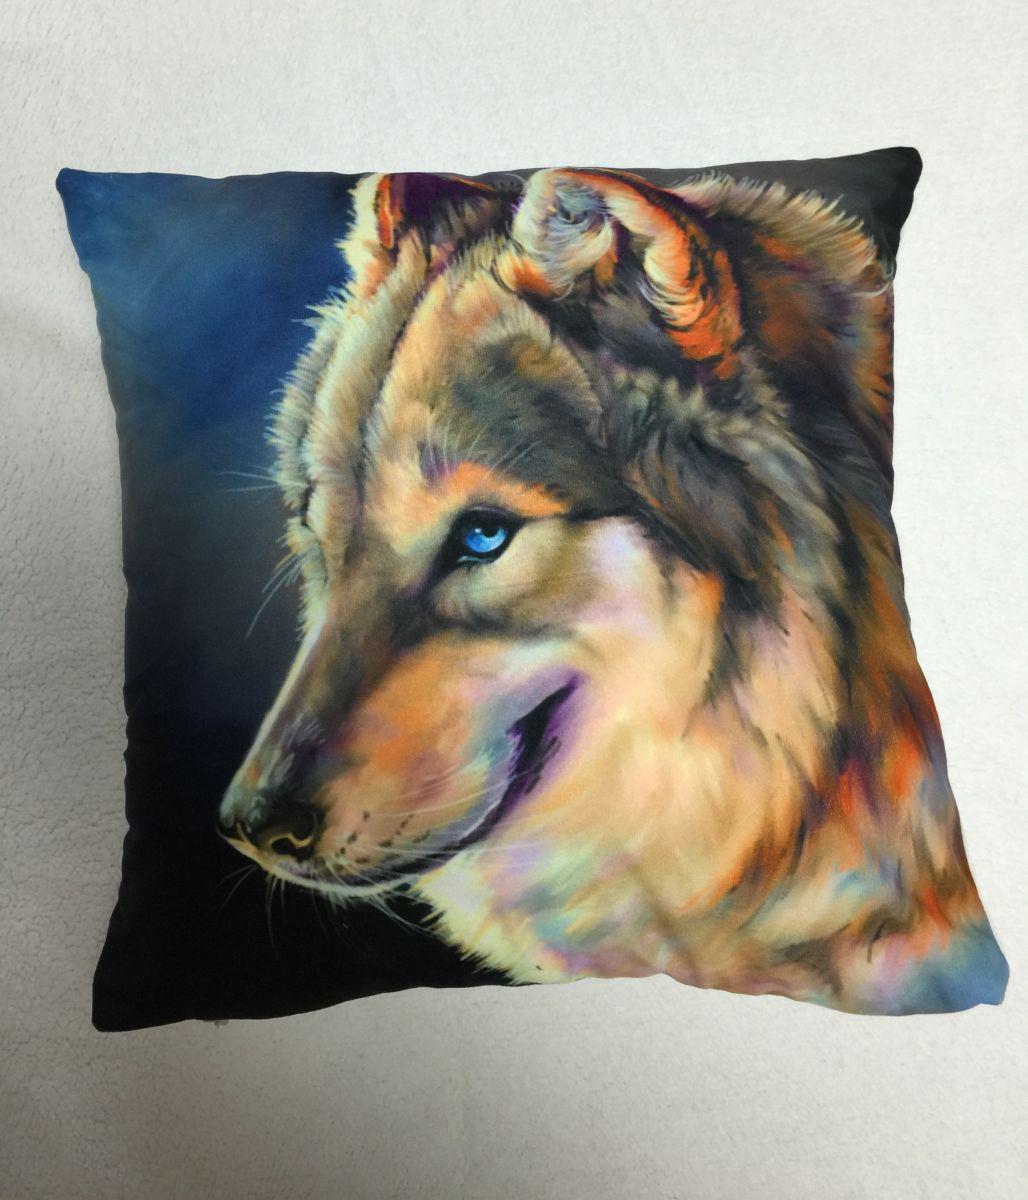 horse sofa slipcovers small tables uk 3d designs faux fur throws cheetah blanket